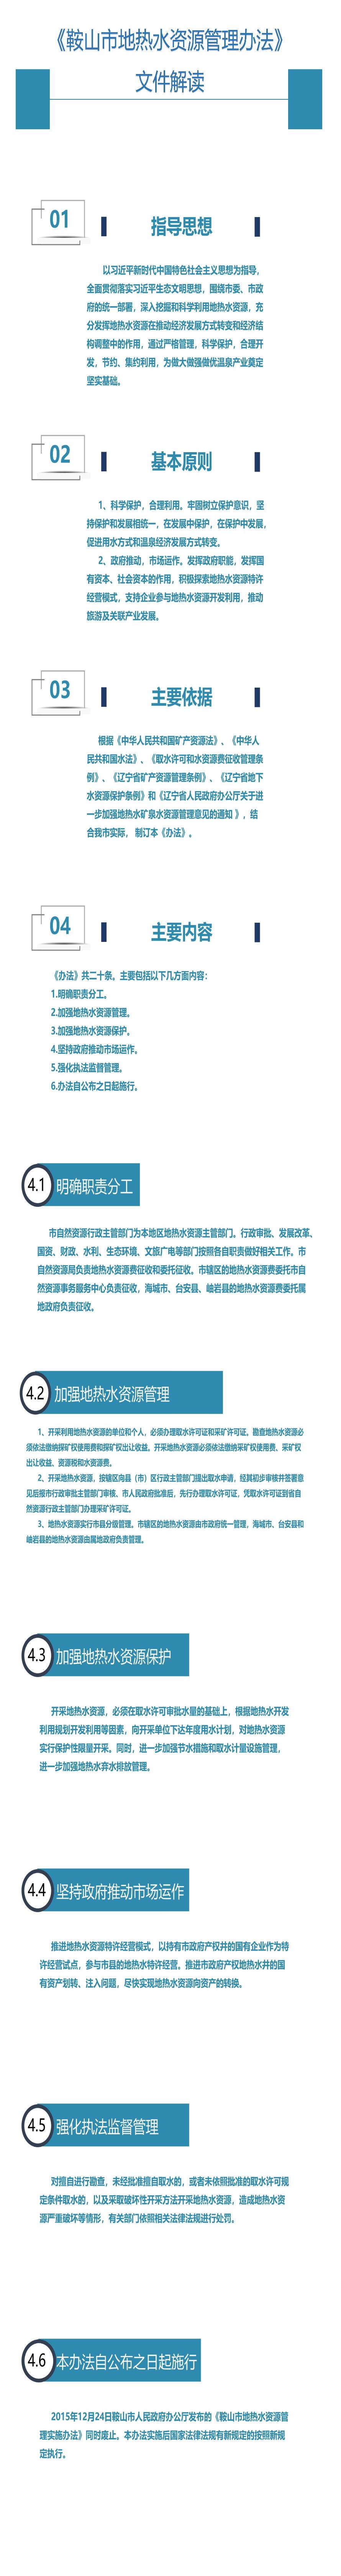 C:UsersAdministratorDesktop\u300a鞍山市人民政府办公室关于印发鞍山市地热水资源管理办法的通知》文件解读.png